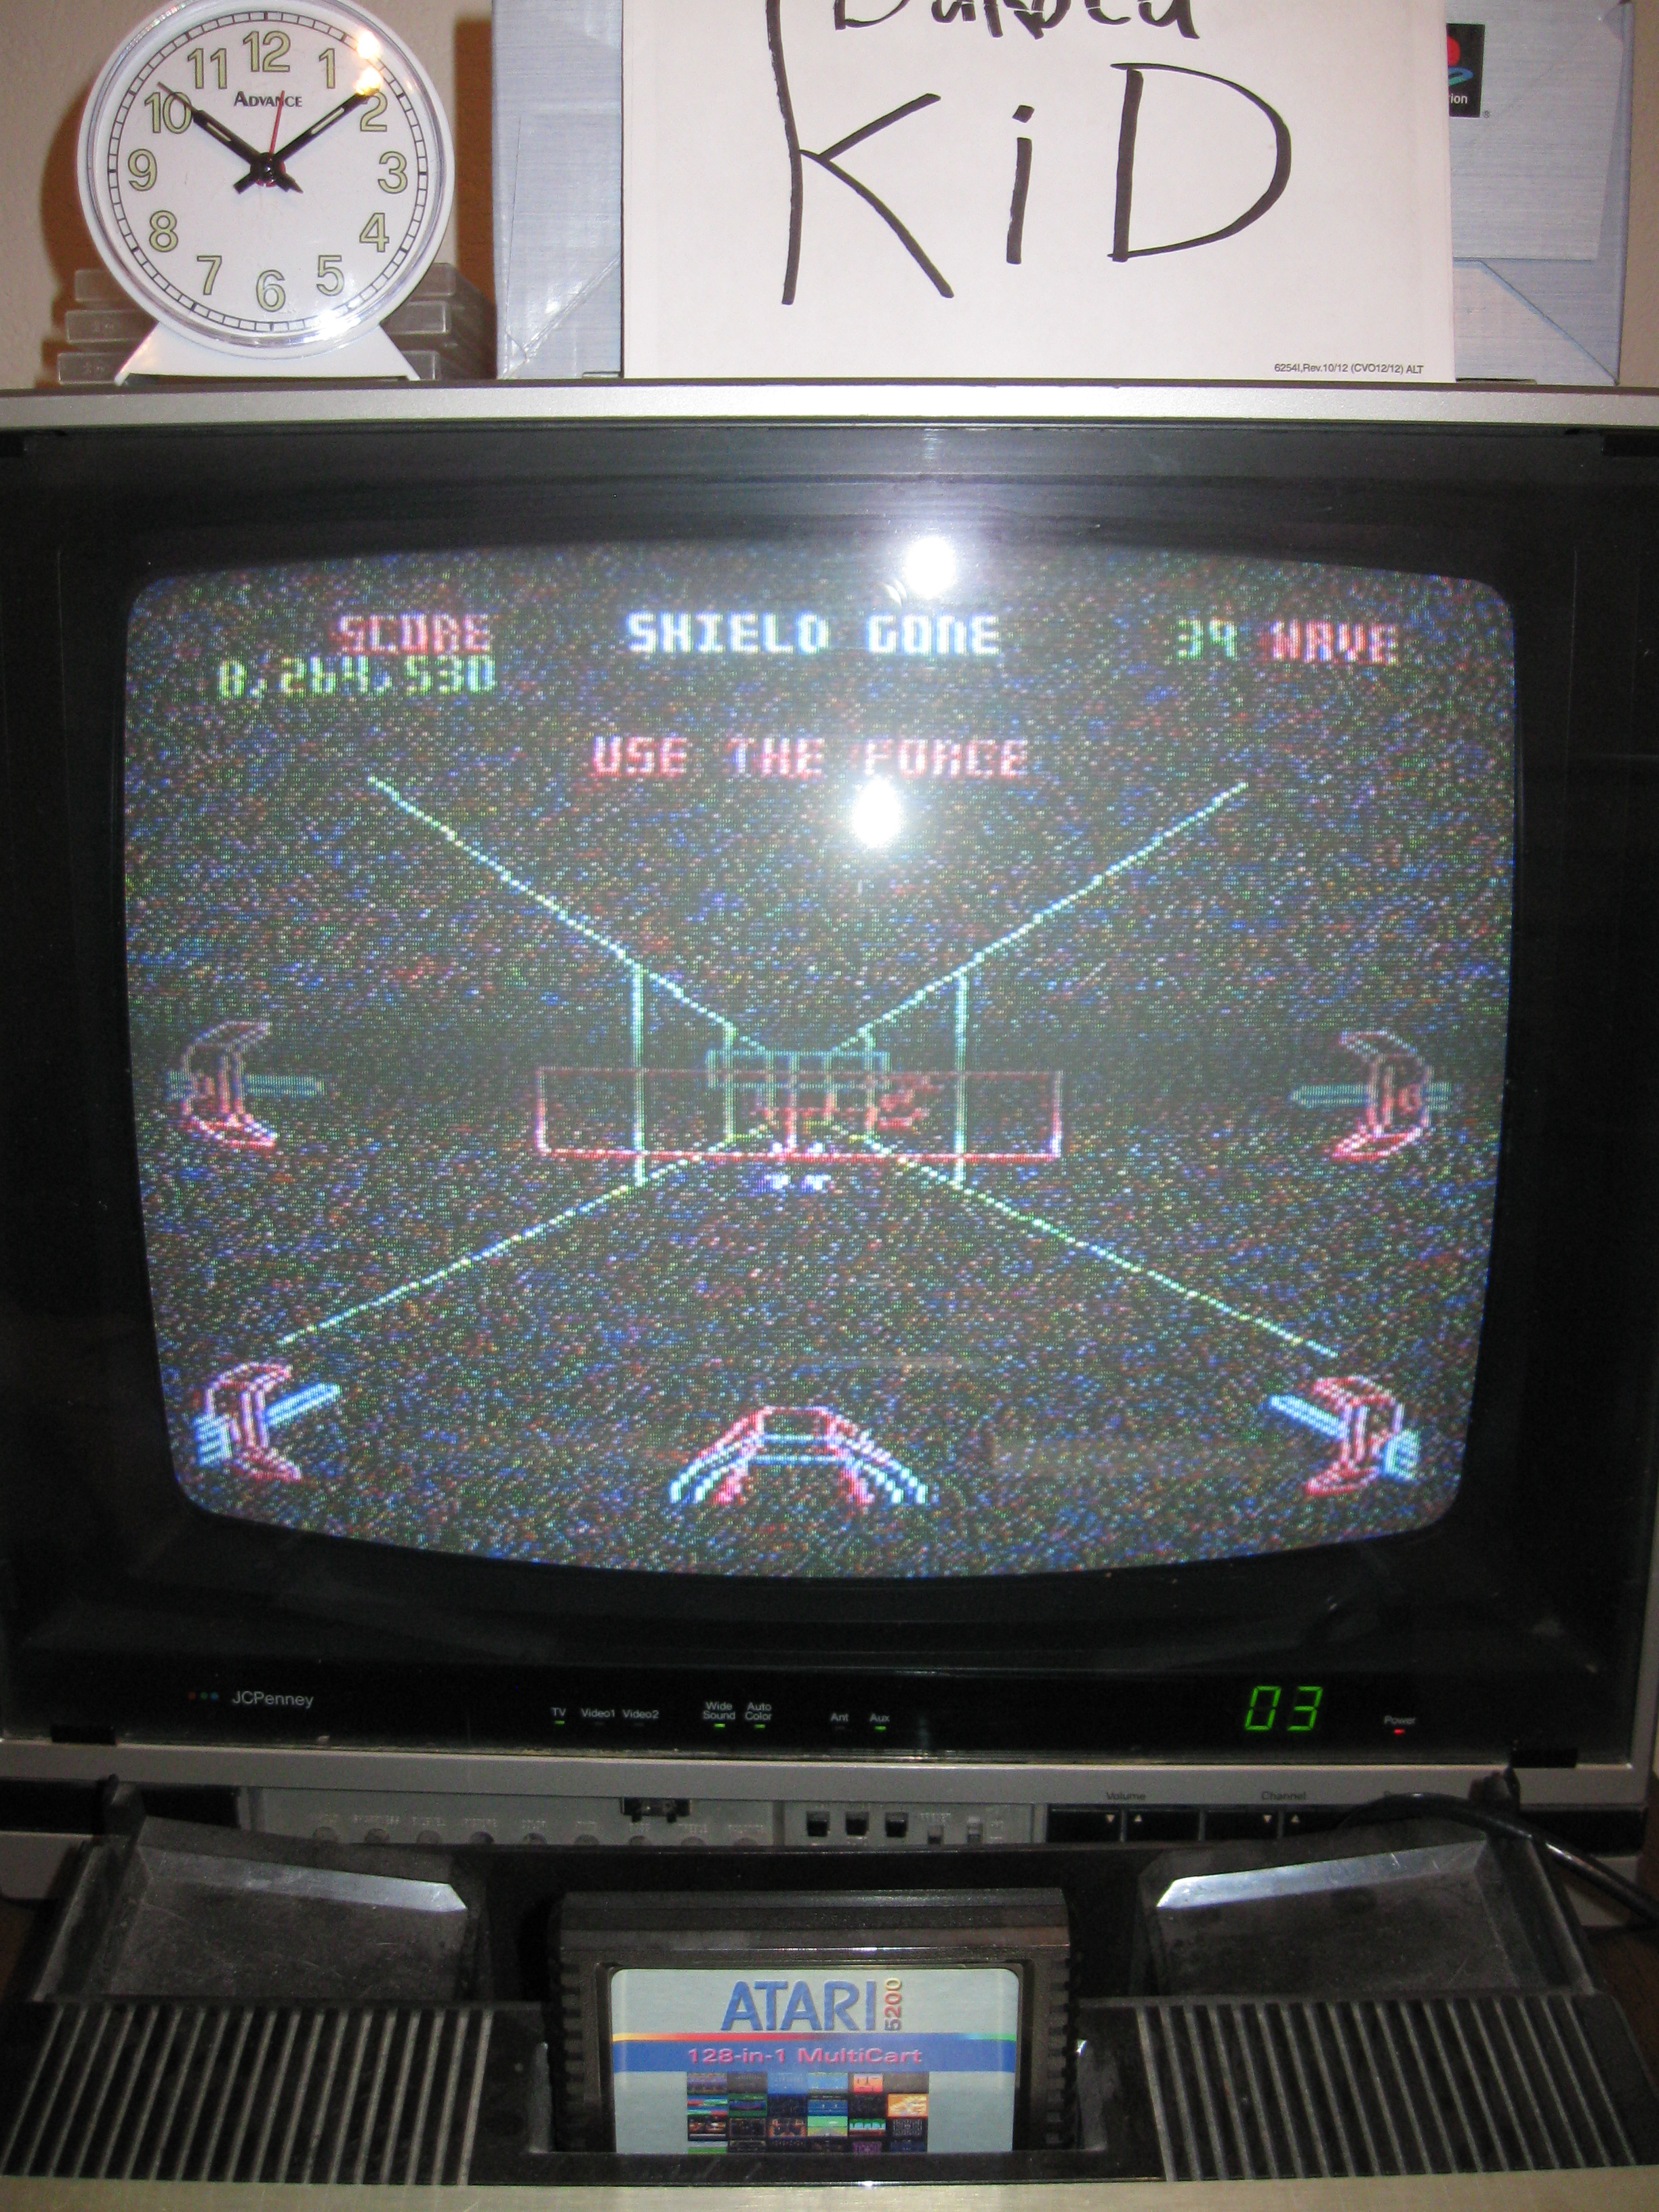 DakotaKid: Star Wars: The Arcade Game [Skill 1] (Atari 5200) 8,264,530 points on 2016-04-18 12:41:14